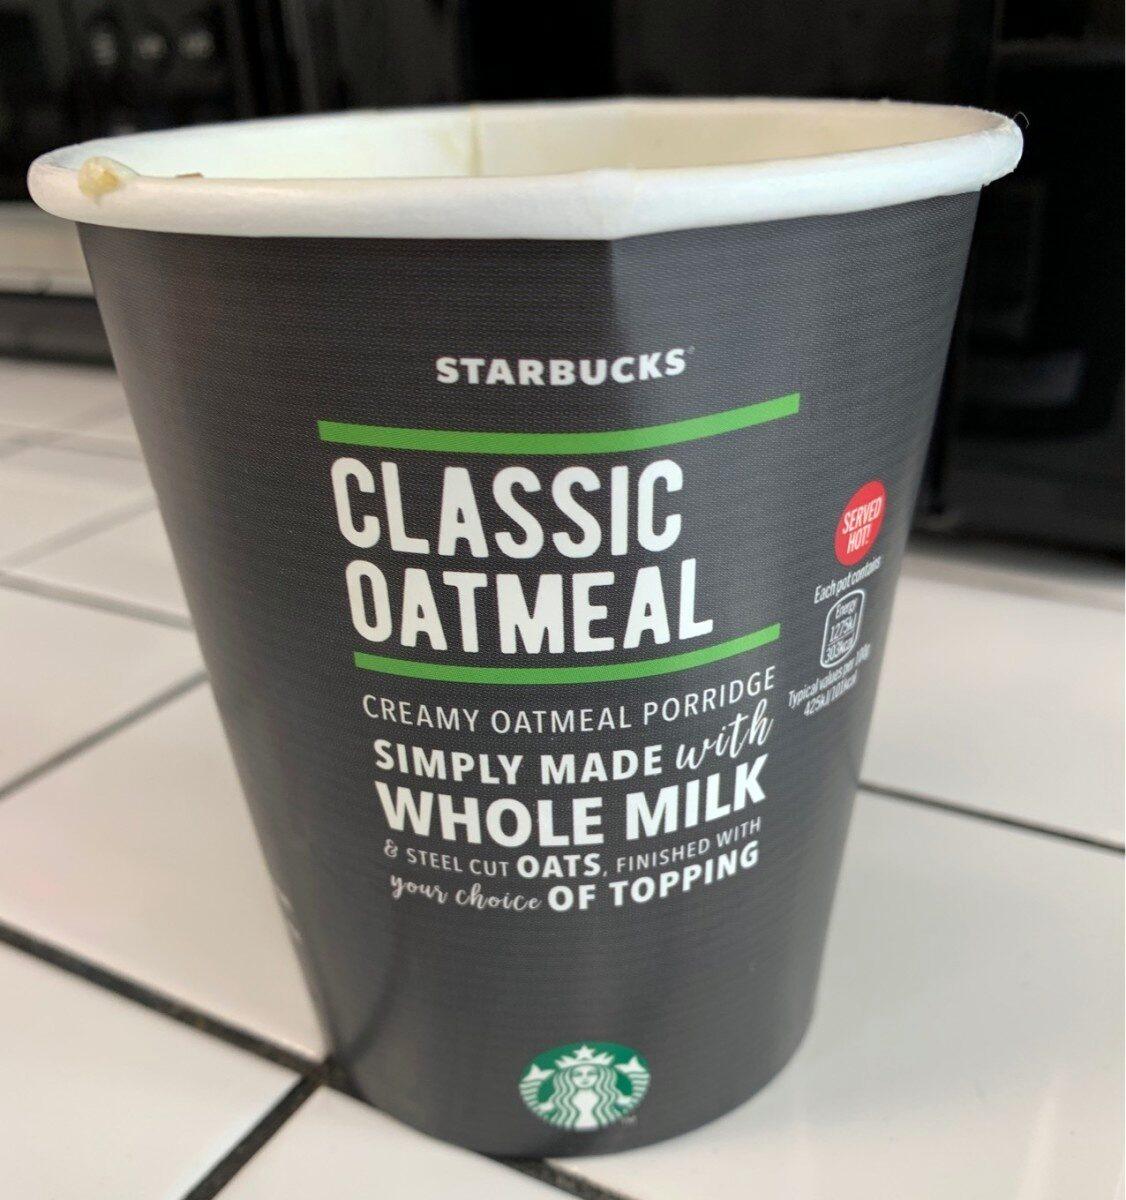 Classic Oatmeal - Product